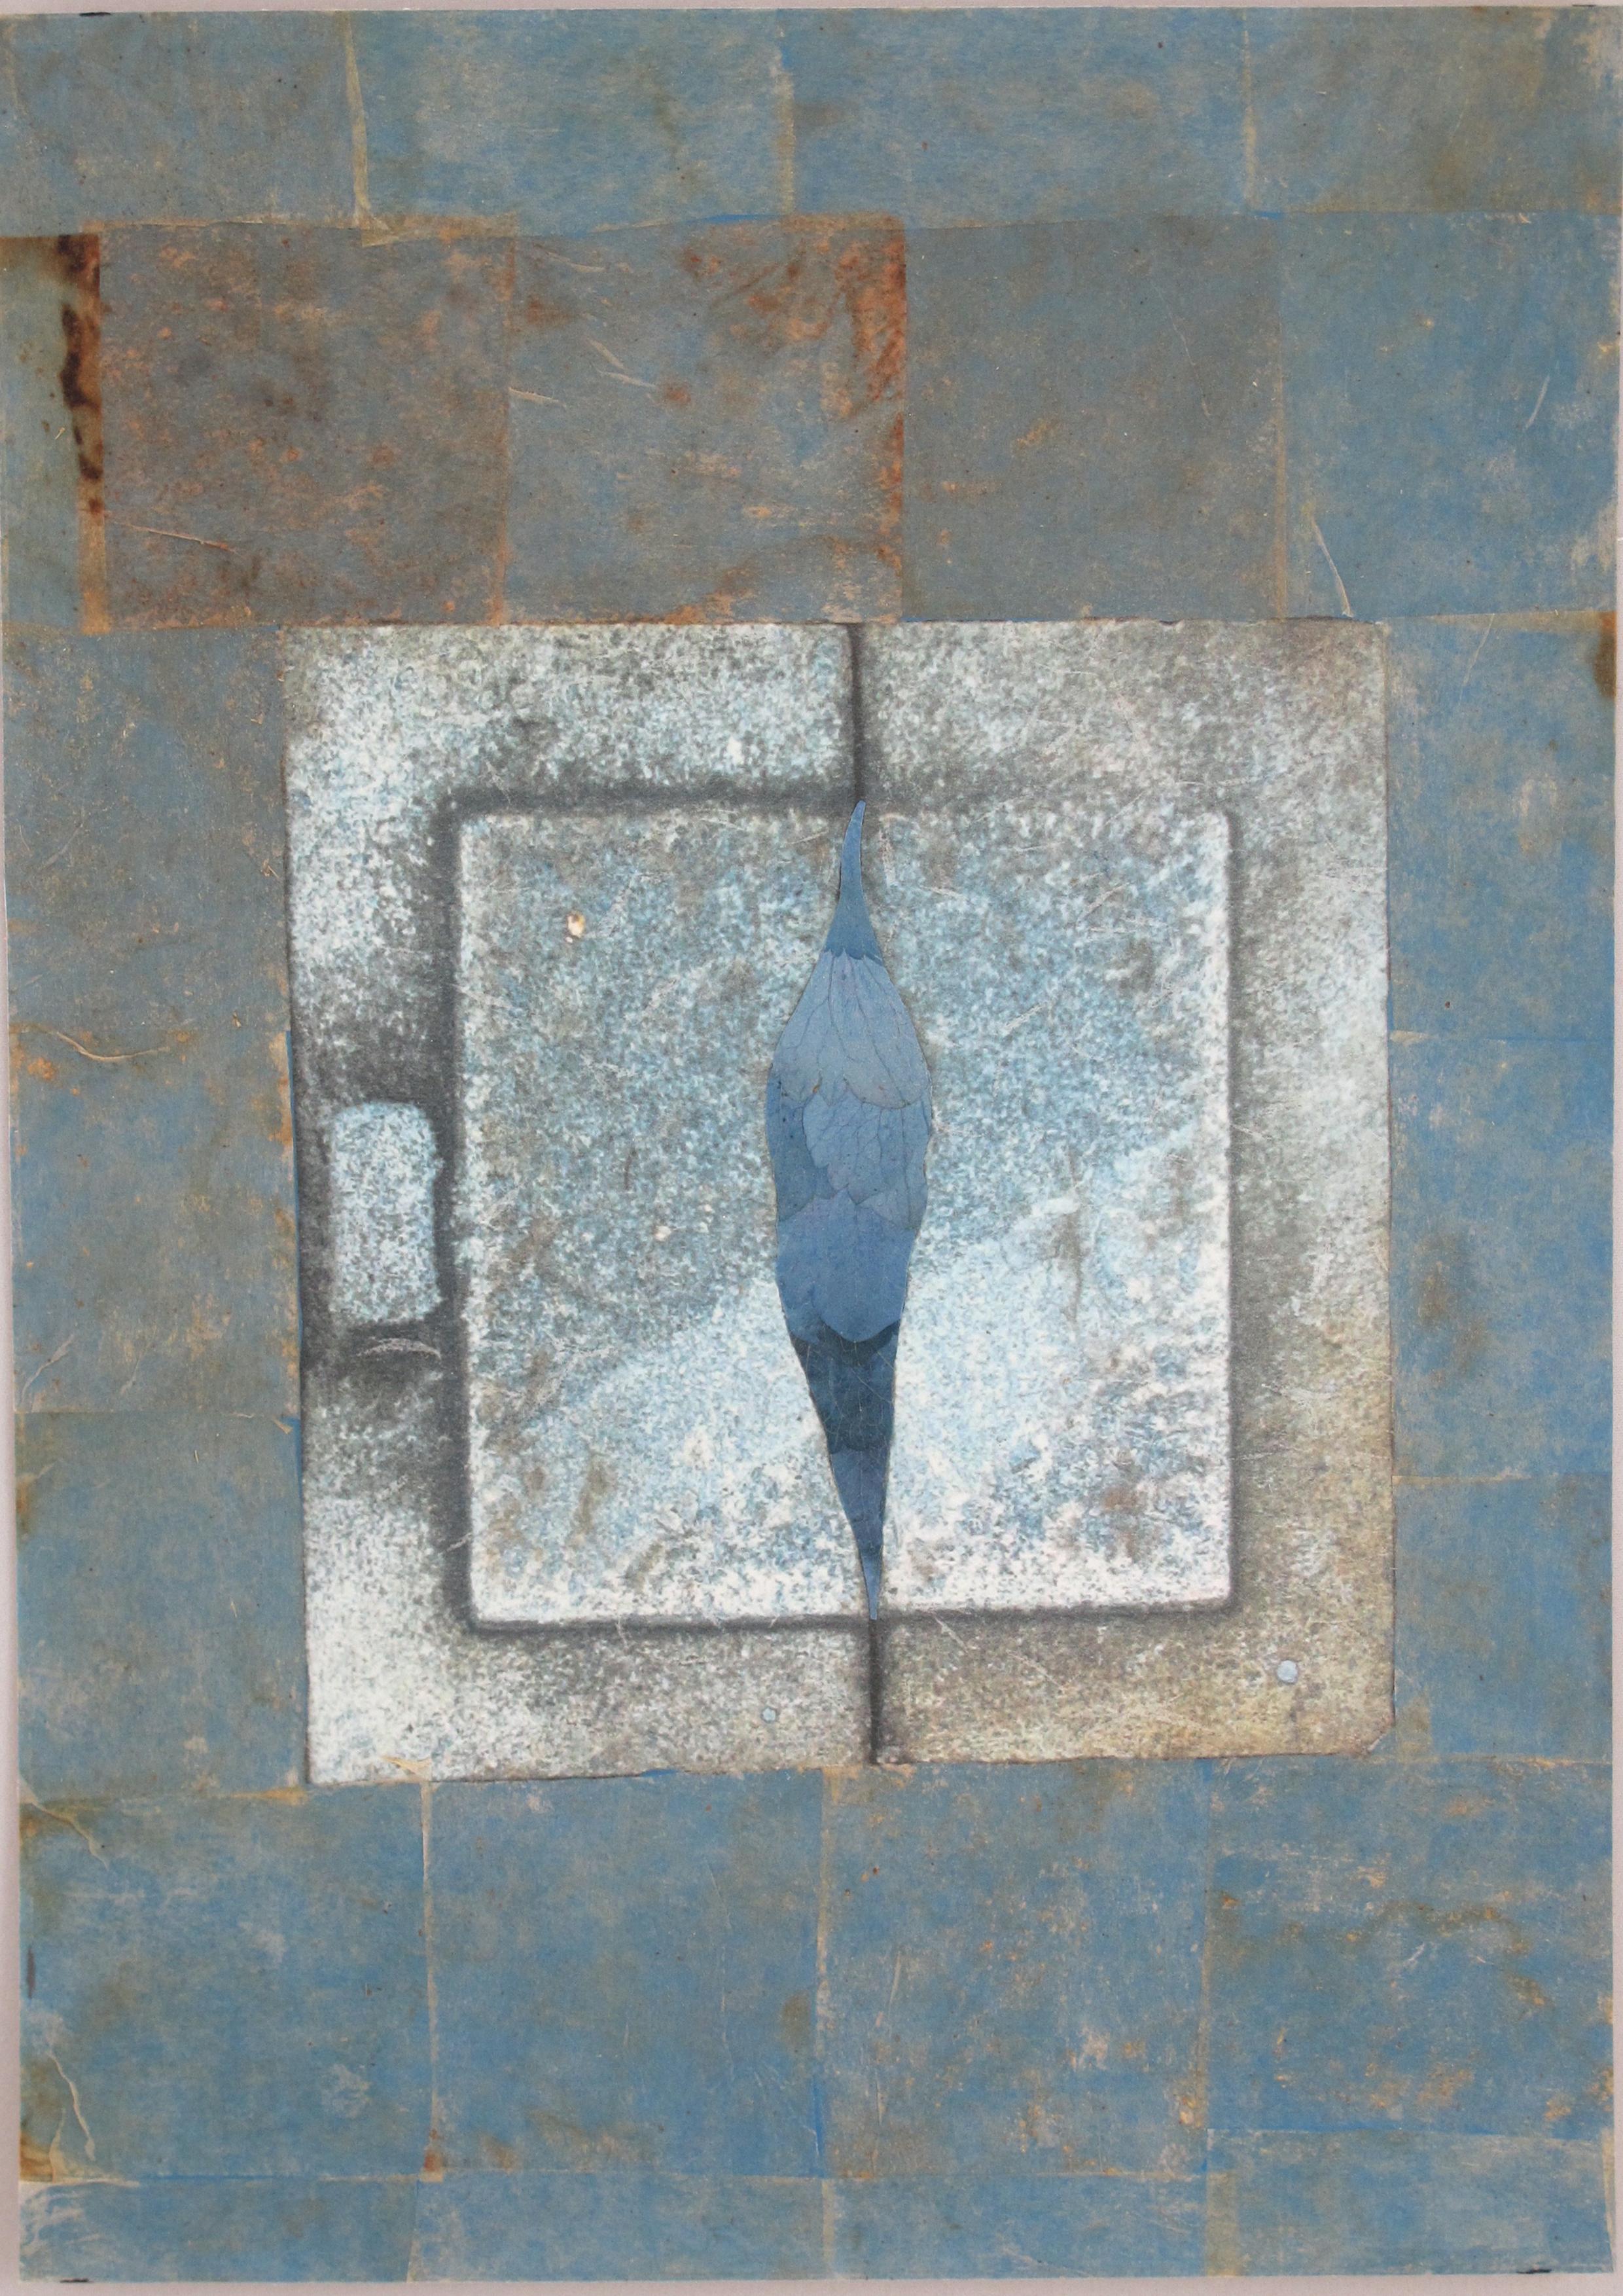 Blue Fissure